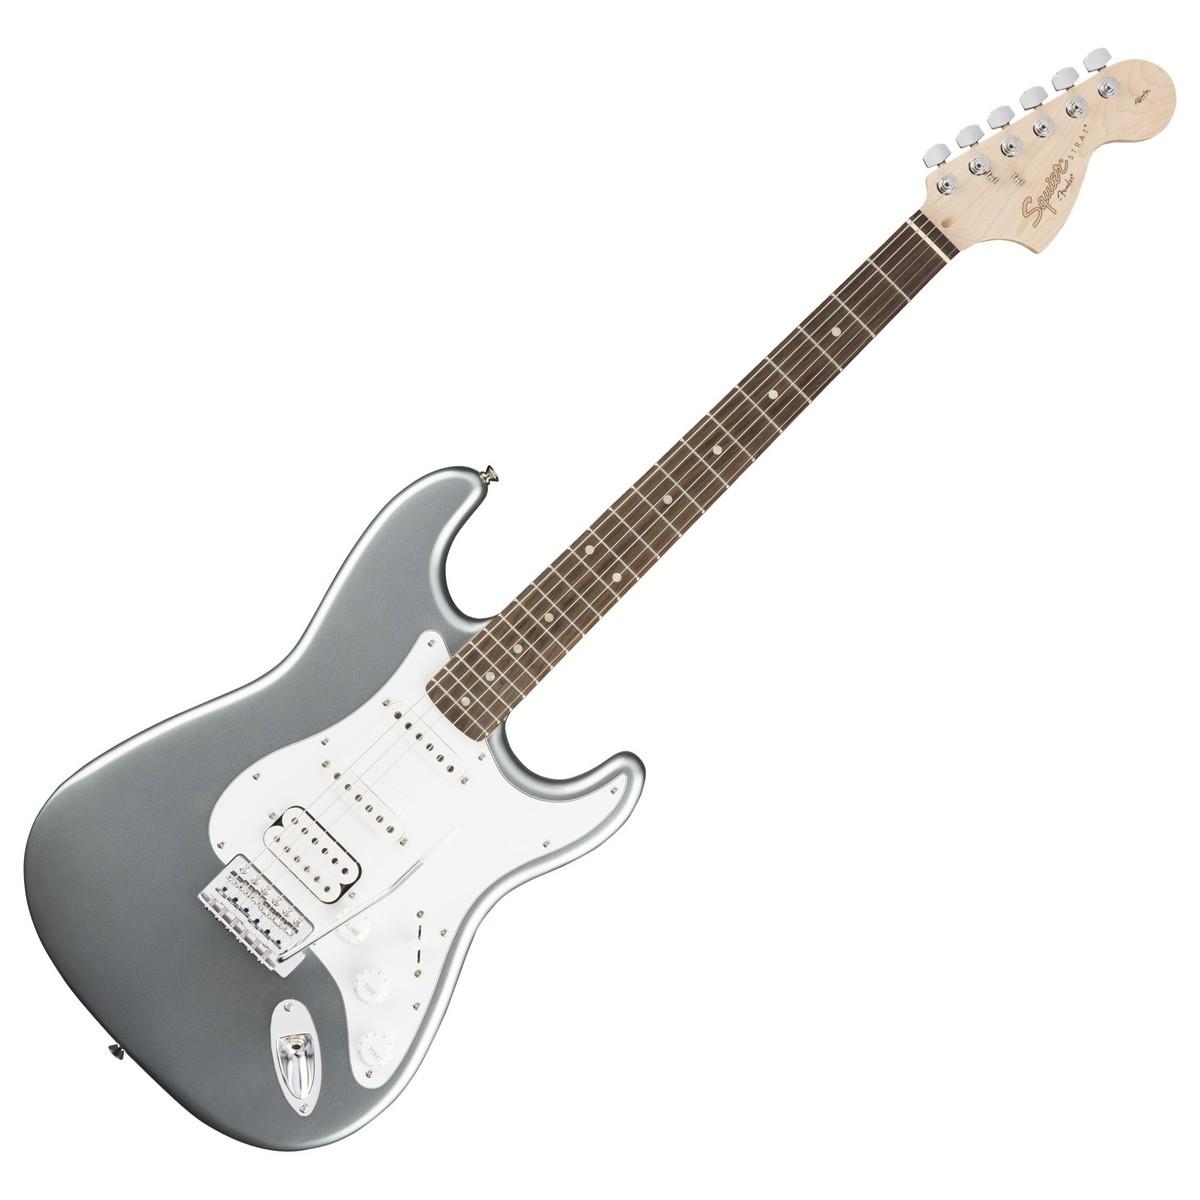 squier affinity stratocaster hss slick silver at gear4music. Black Bedroom Furniture Sets. Home Design Ideas